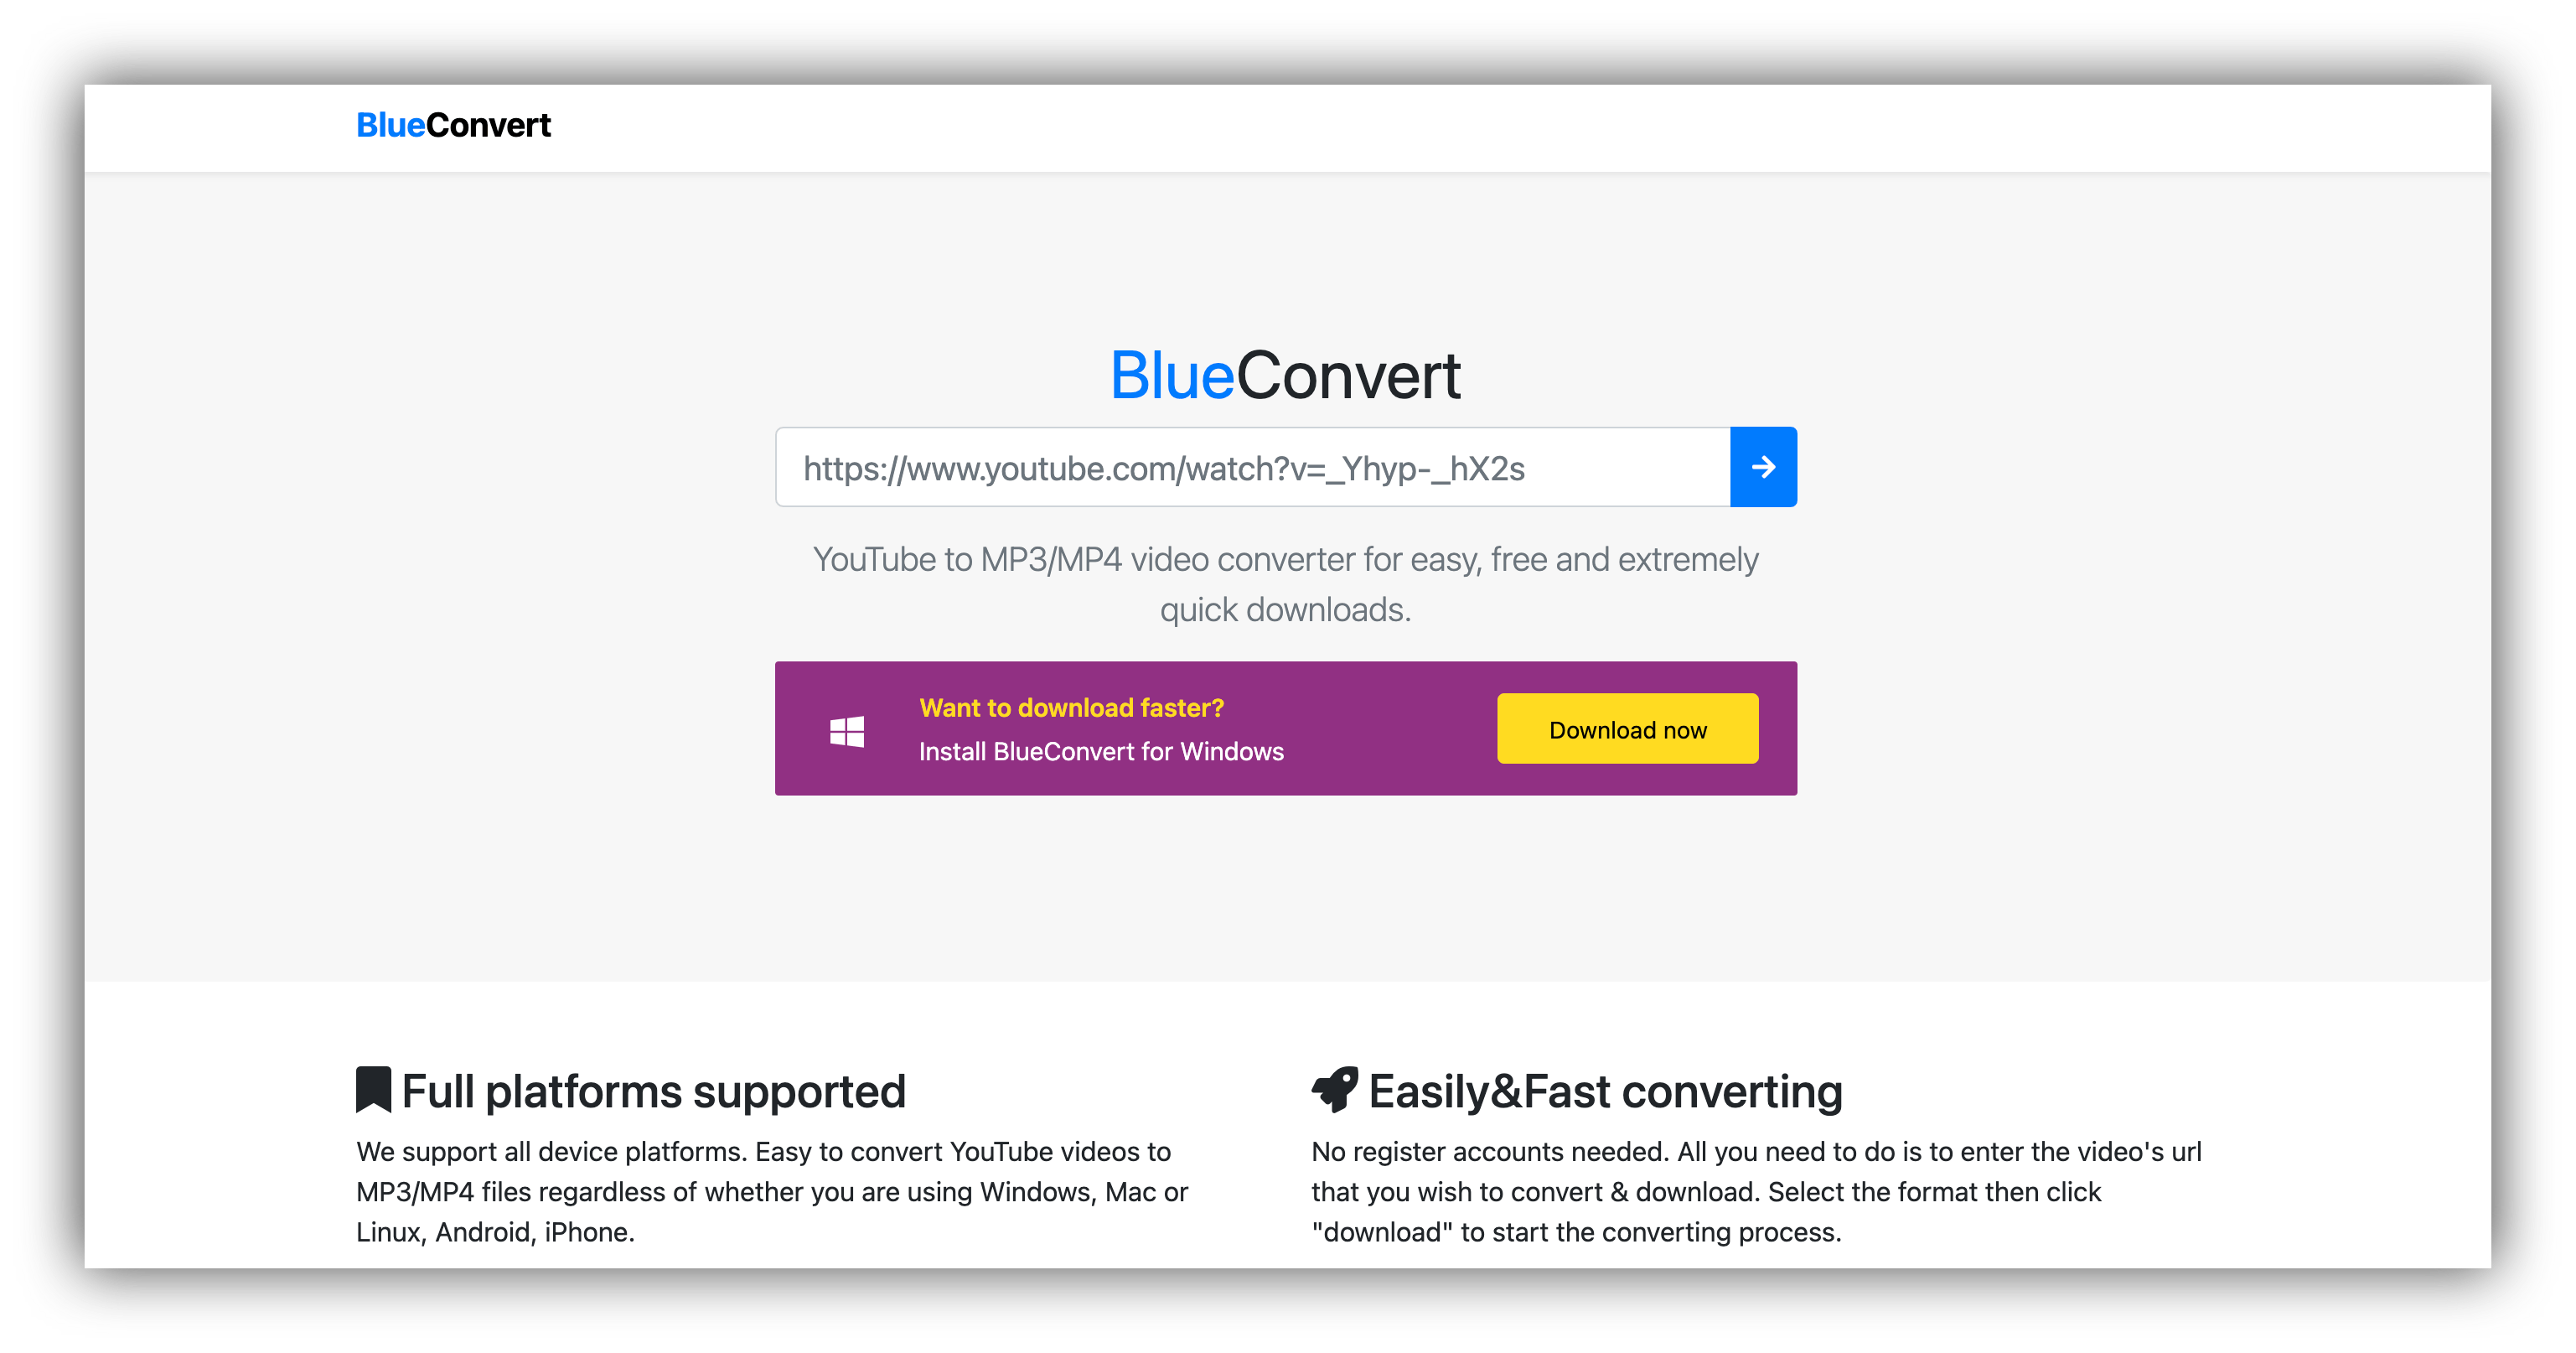 blue convert homepage